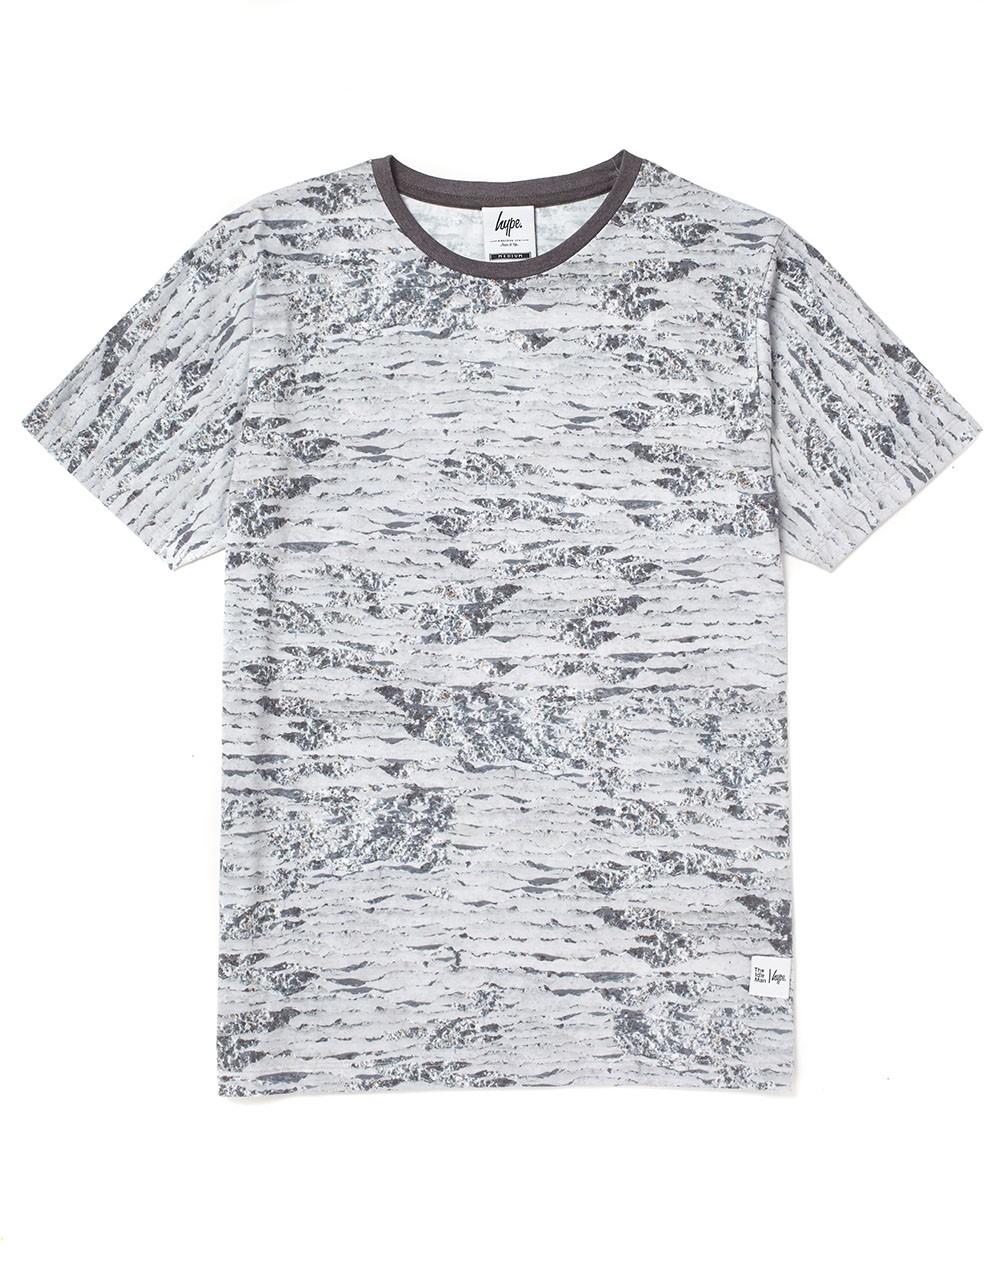 All Over Print T Shirt Printing Bcd Tofu House